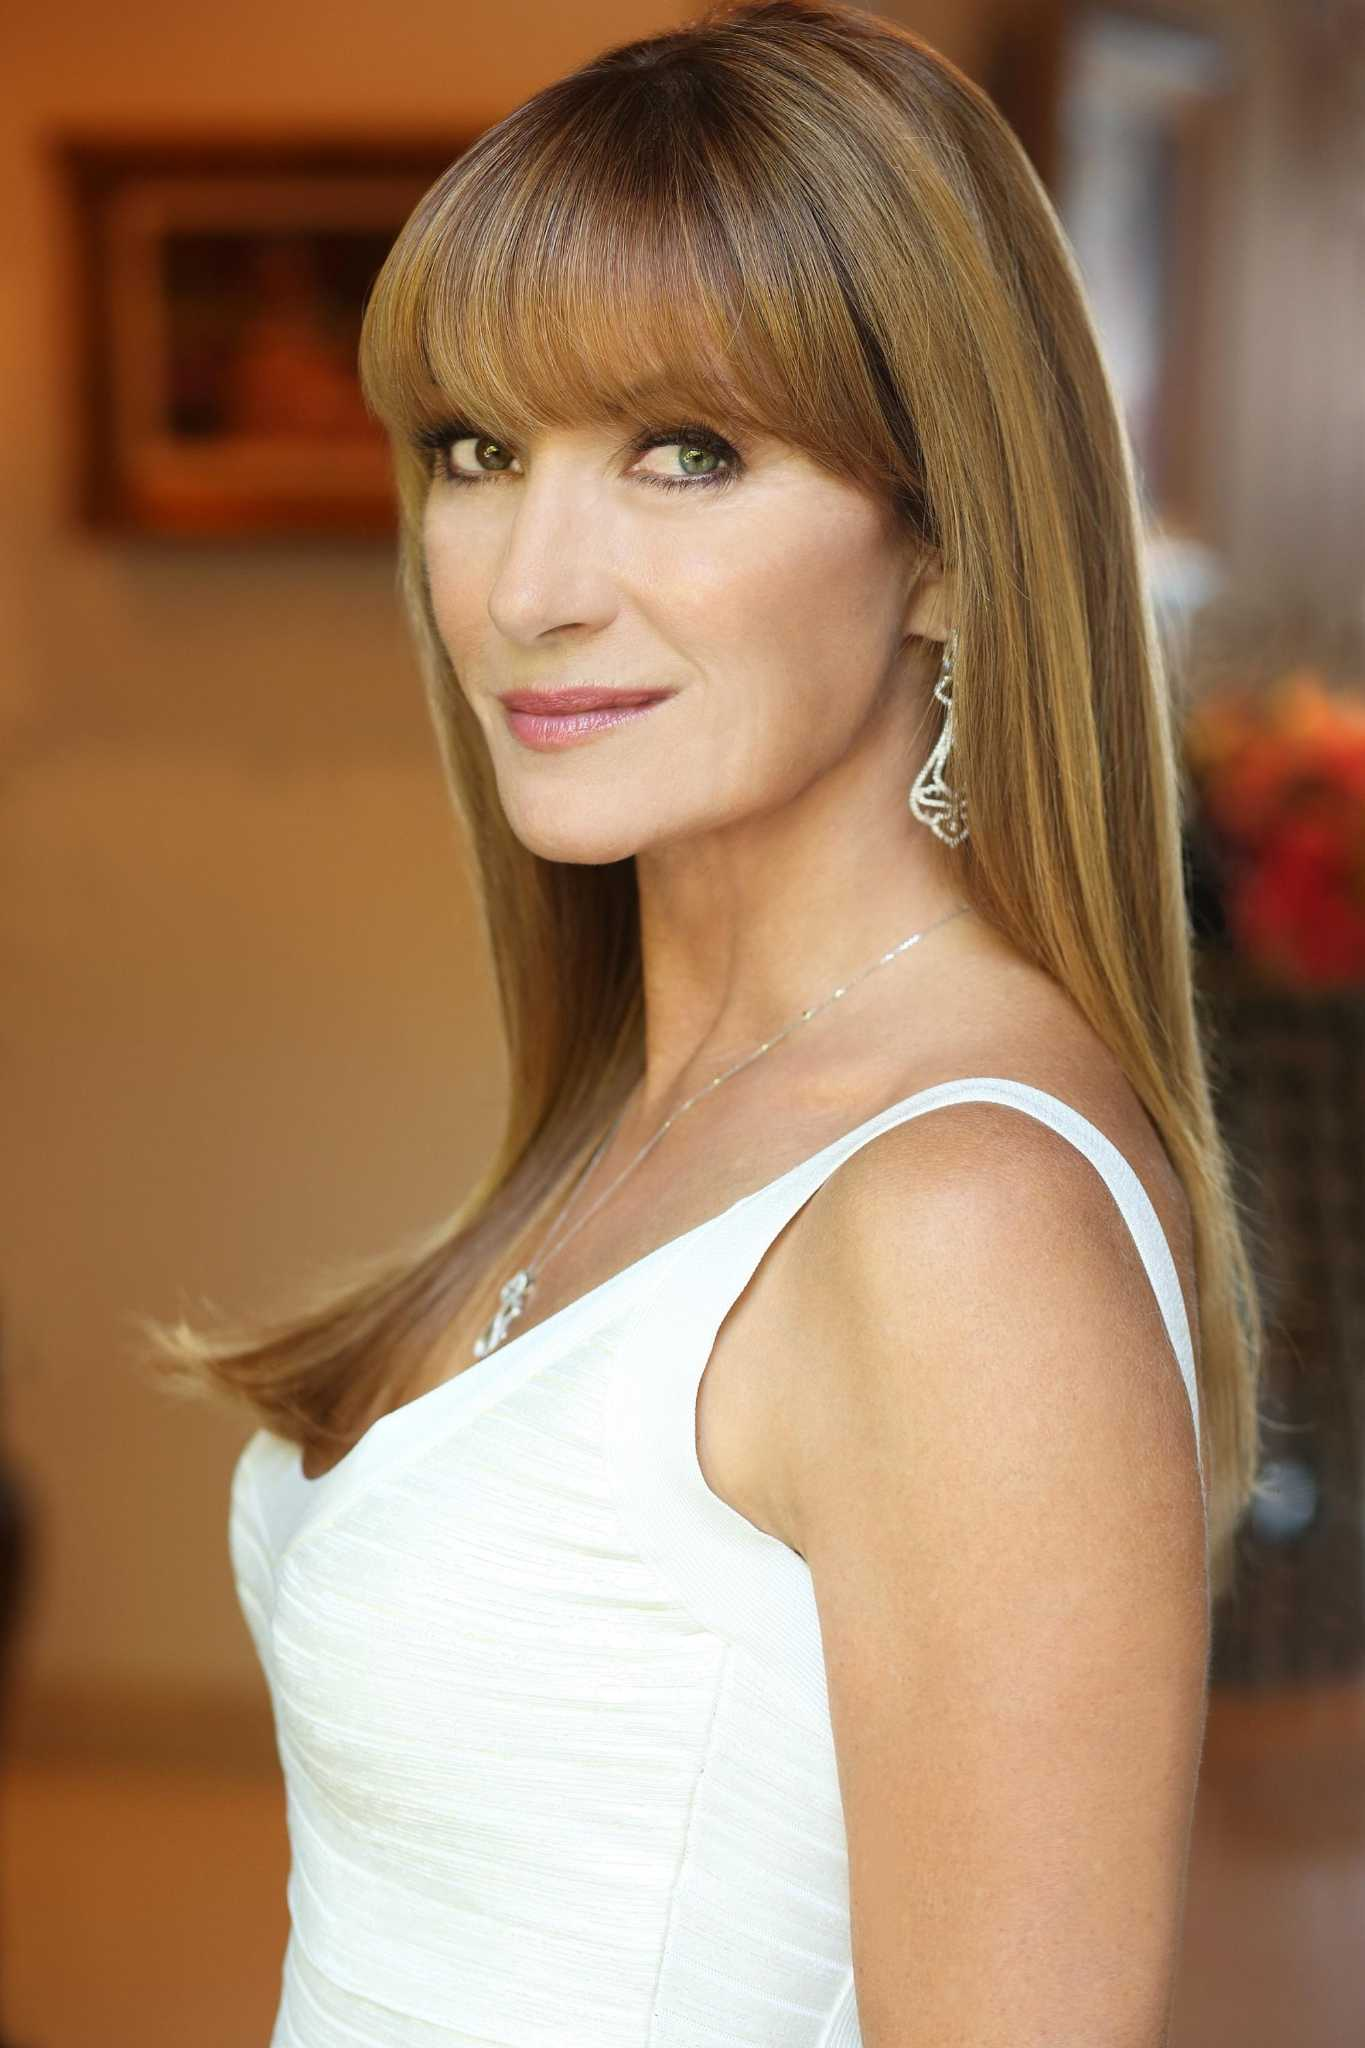 Jane Seymour Wedding Crashers.Jane Seymour To Headline Cancer Center Fundraiser Connecticut Post